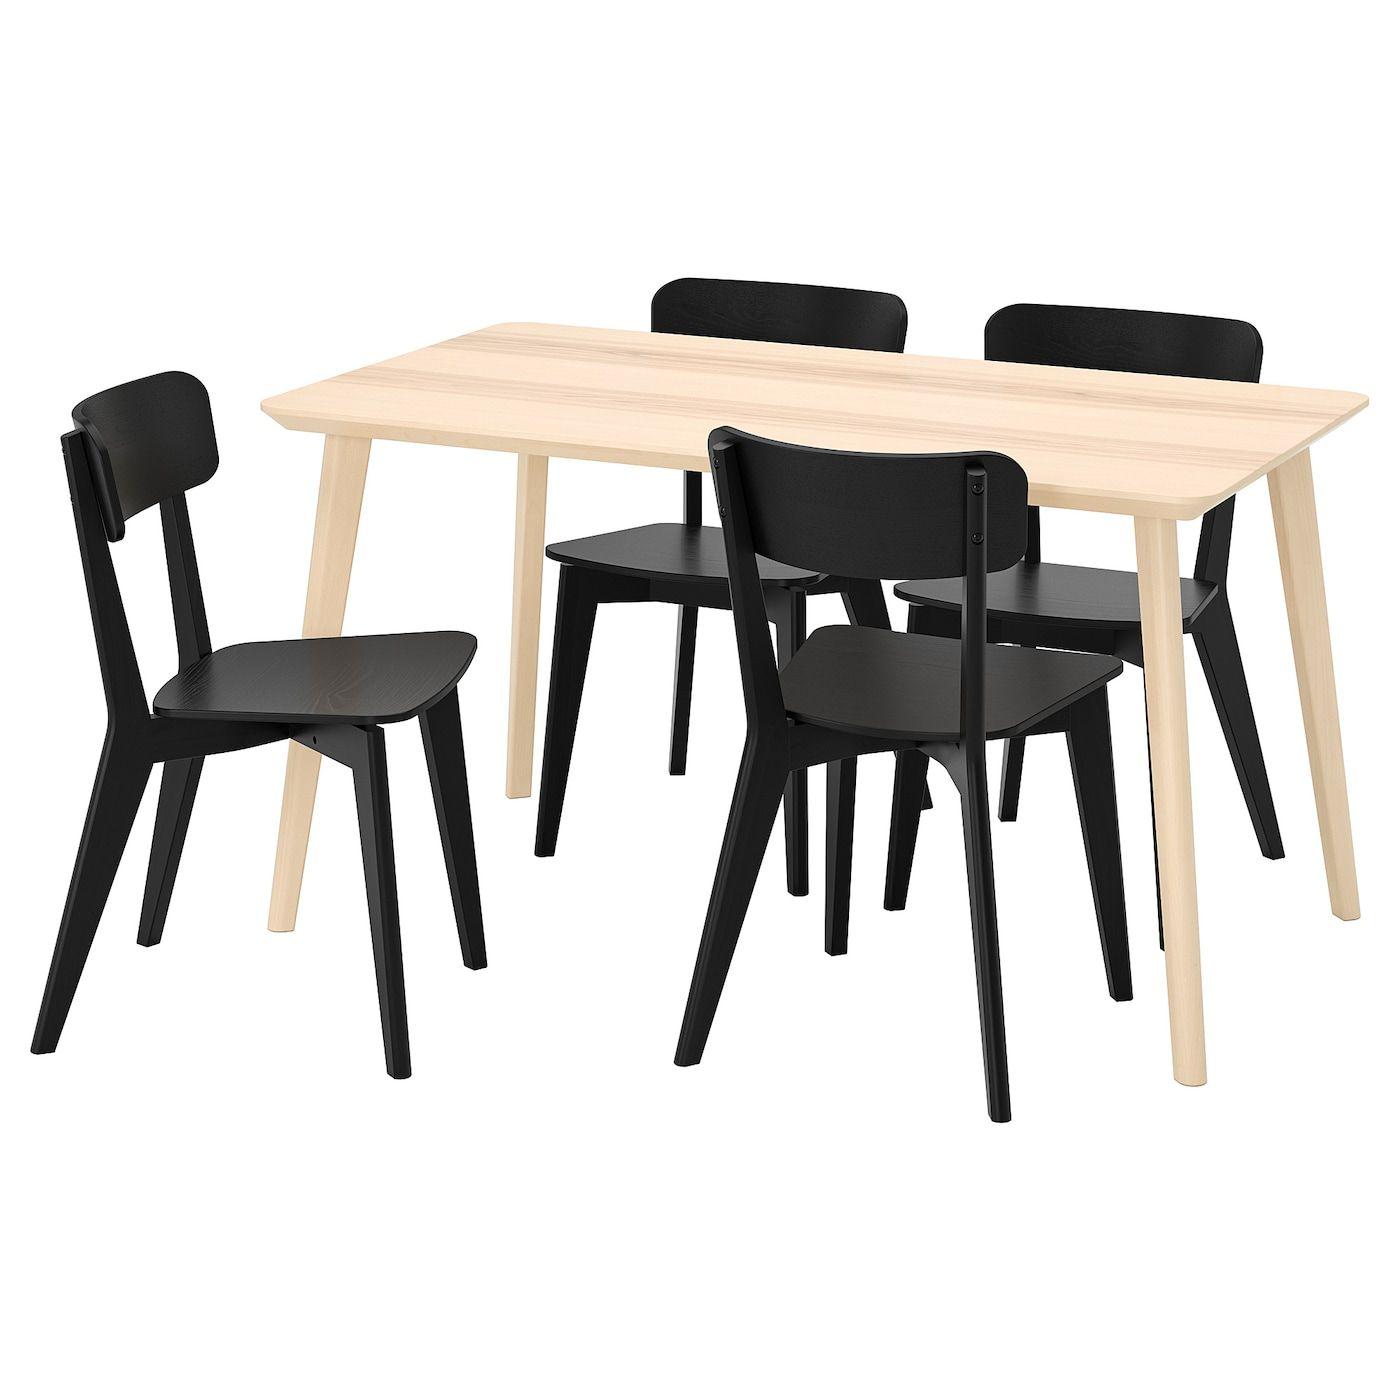 Lisabo Lisabo Table And 4 Chairs Ash Veneer Black Ikea Ikea Chair Table [ 1400 x 1400 Pixel ]